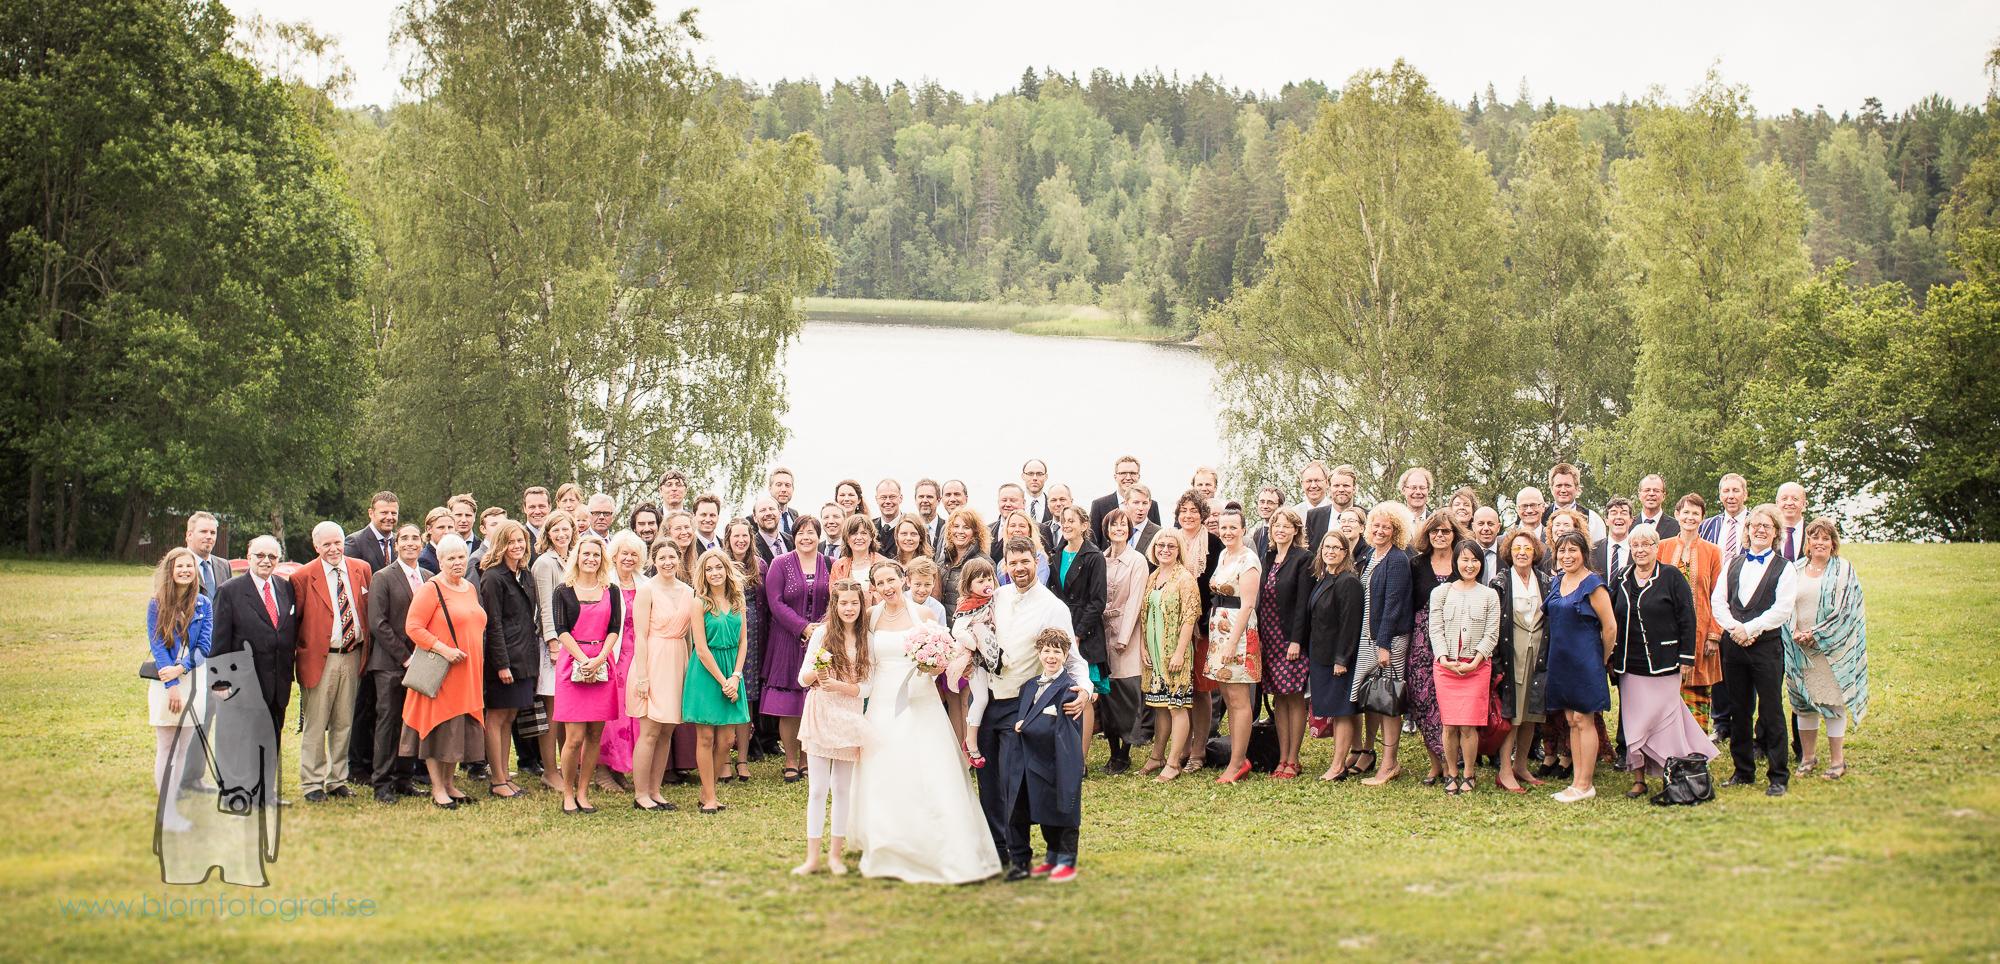 bjornfotograf.se-35971